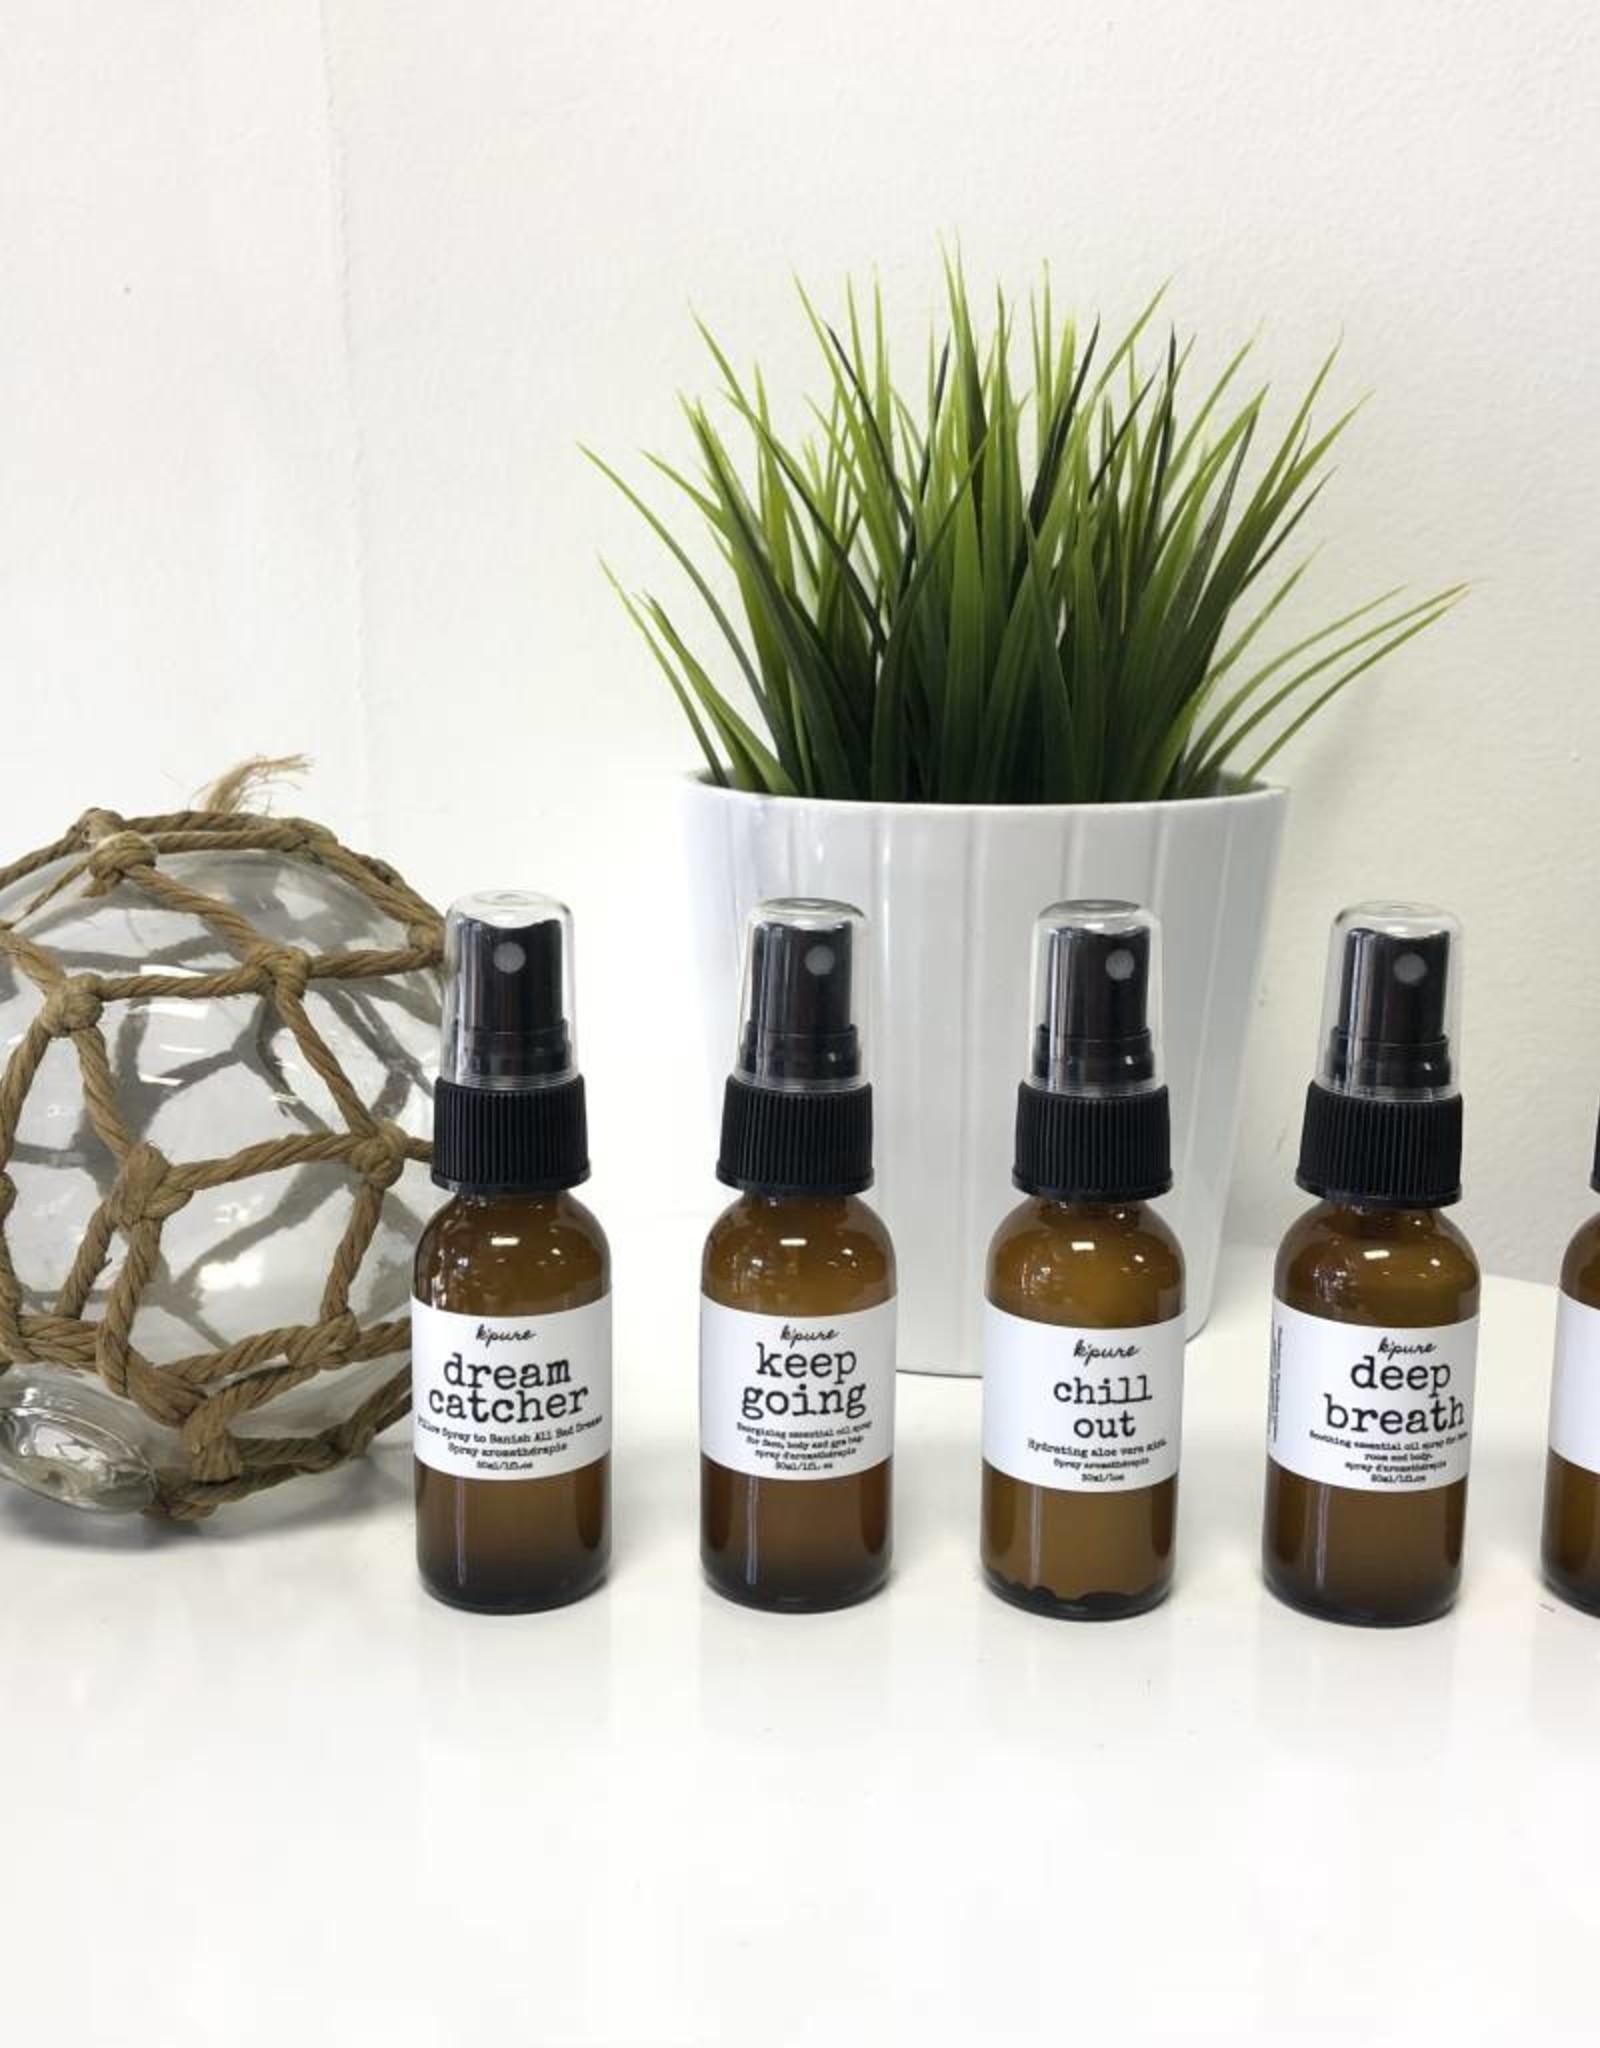 K'PURE SETTLE DOWN essential oil mists, 1oz